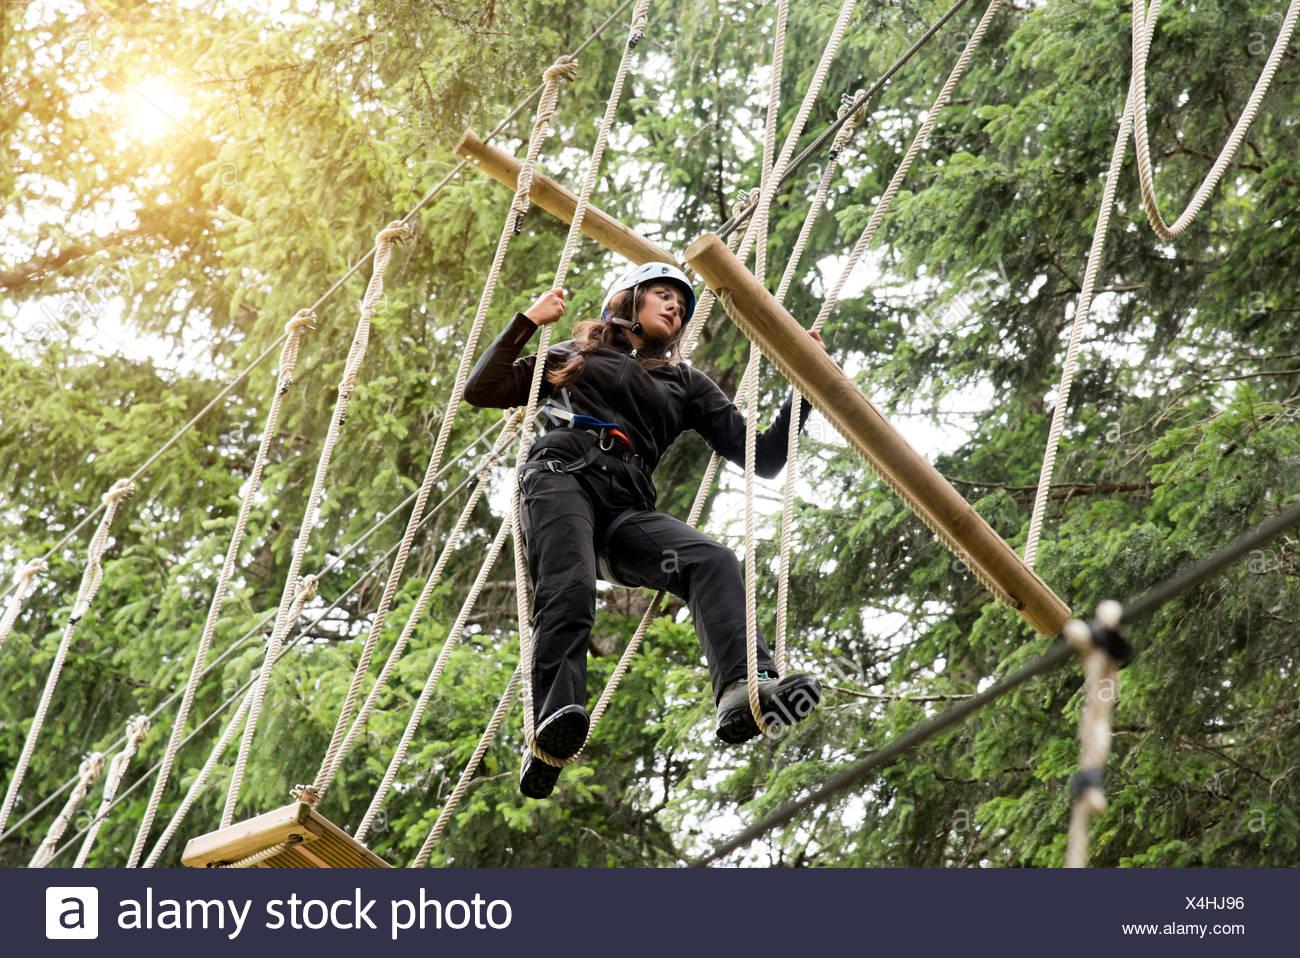 Adolescente en High Rope Course Imagen De Stock